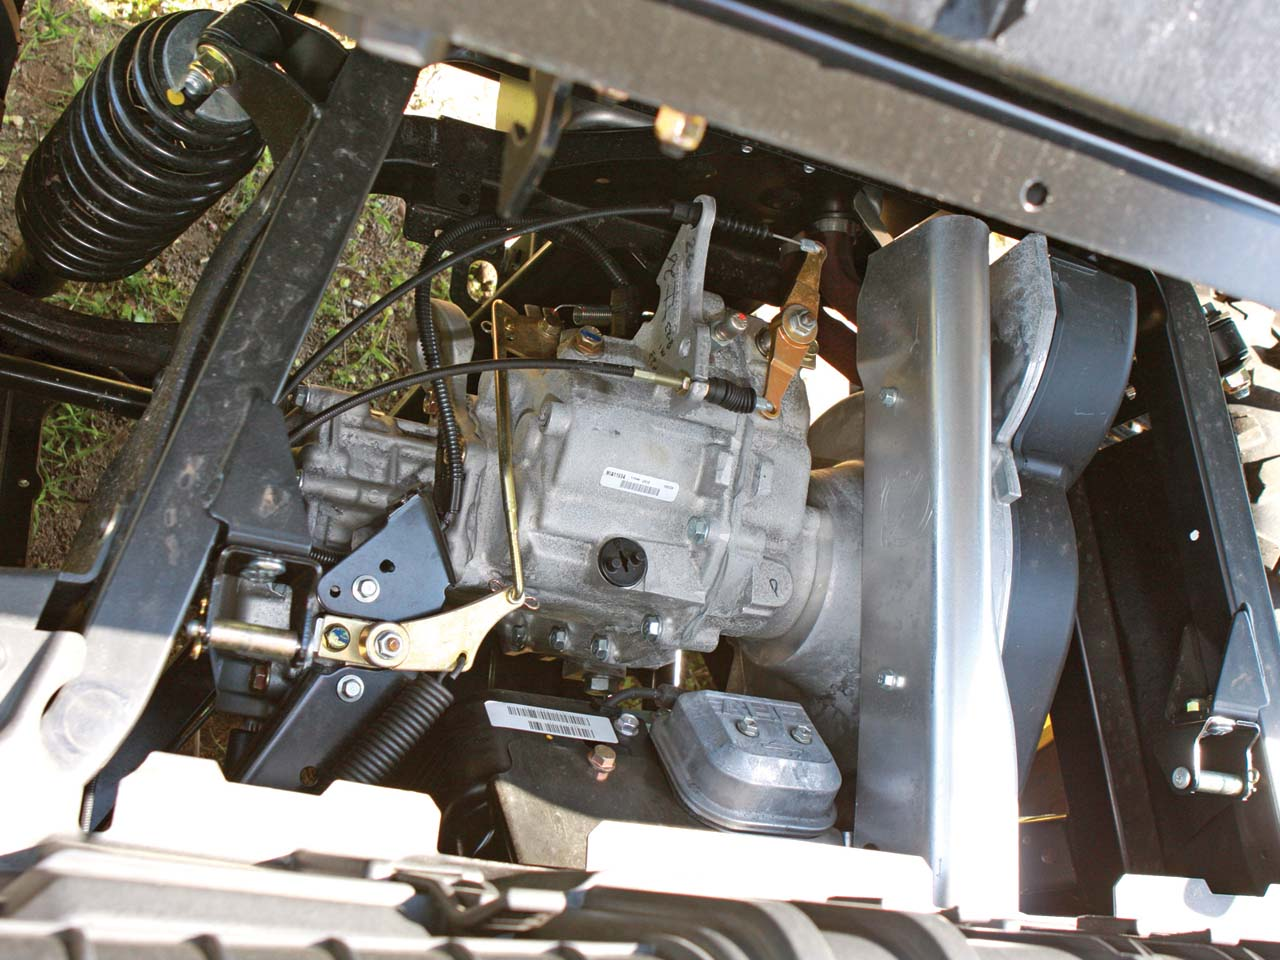 peg perego gator xuv 550 wiring diagram sql server entity relationship john deere ignition